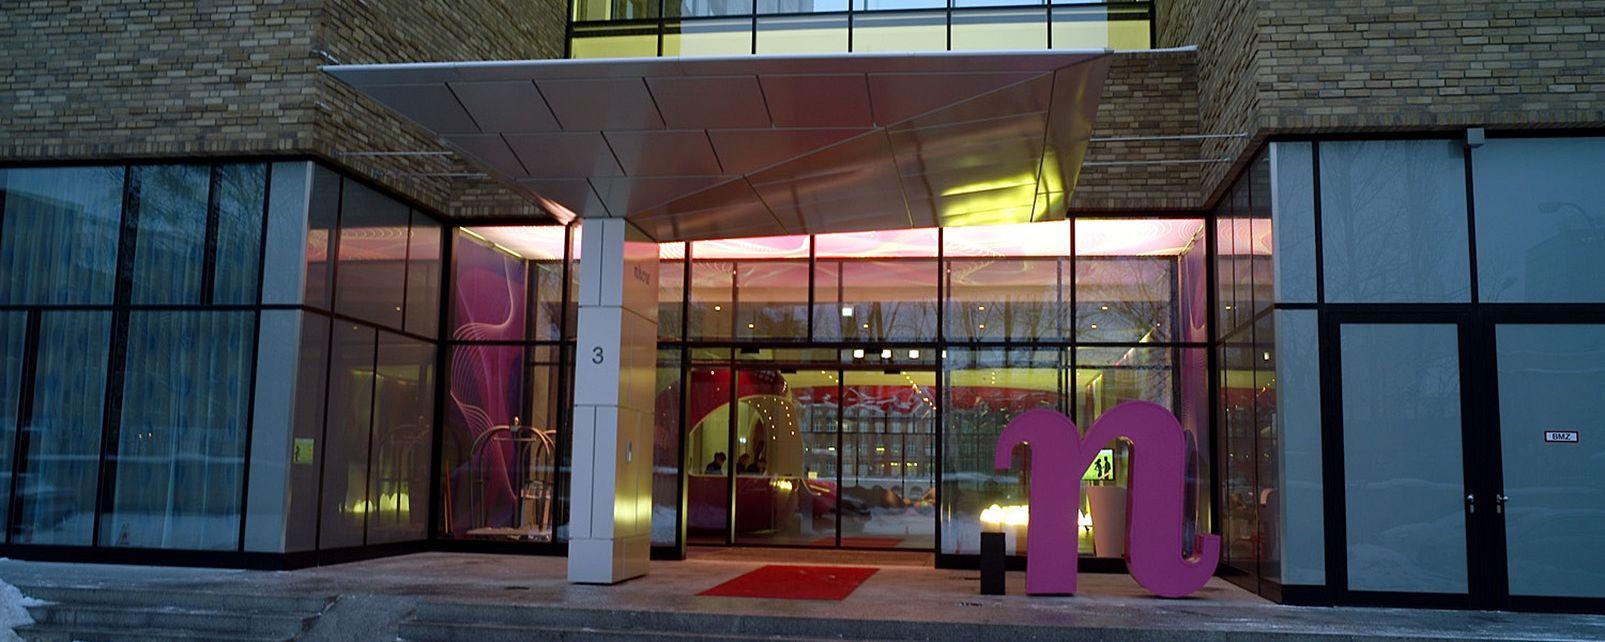 Hotel Nhow Berlin